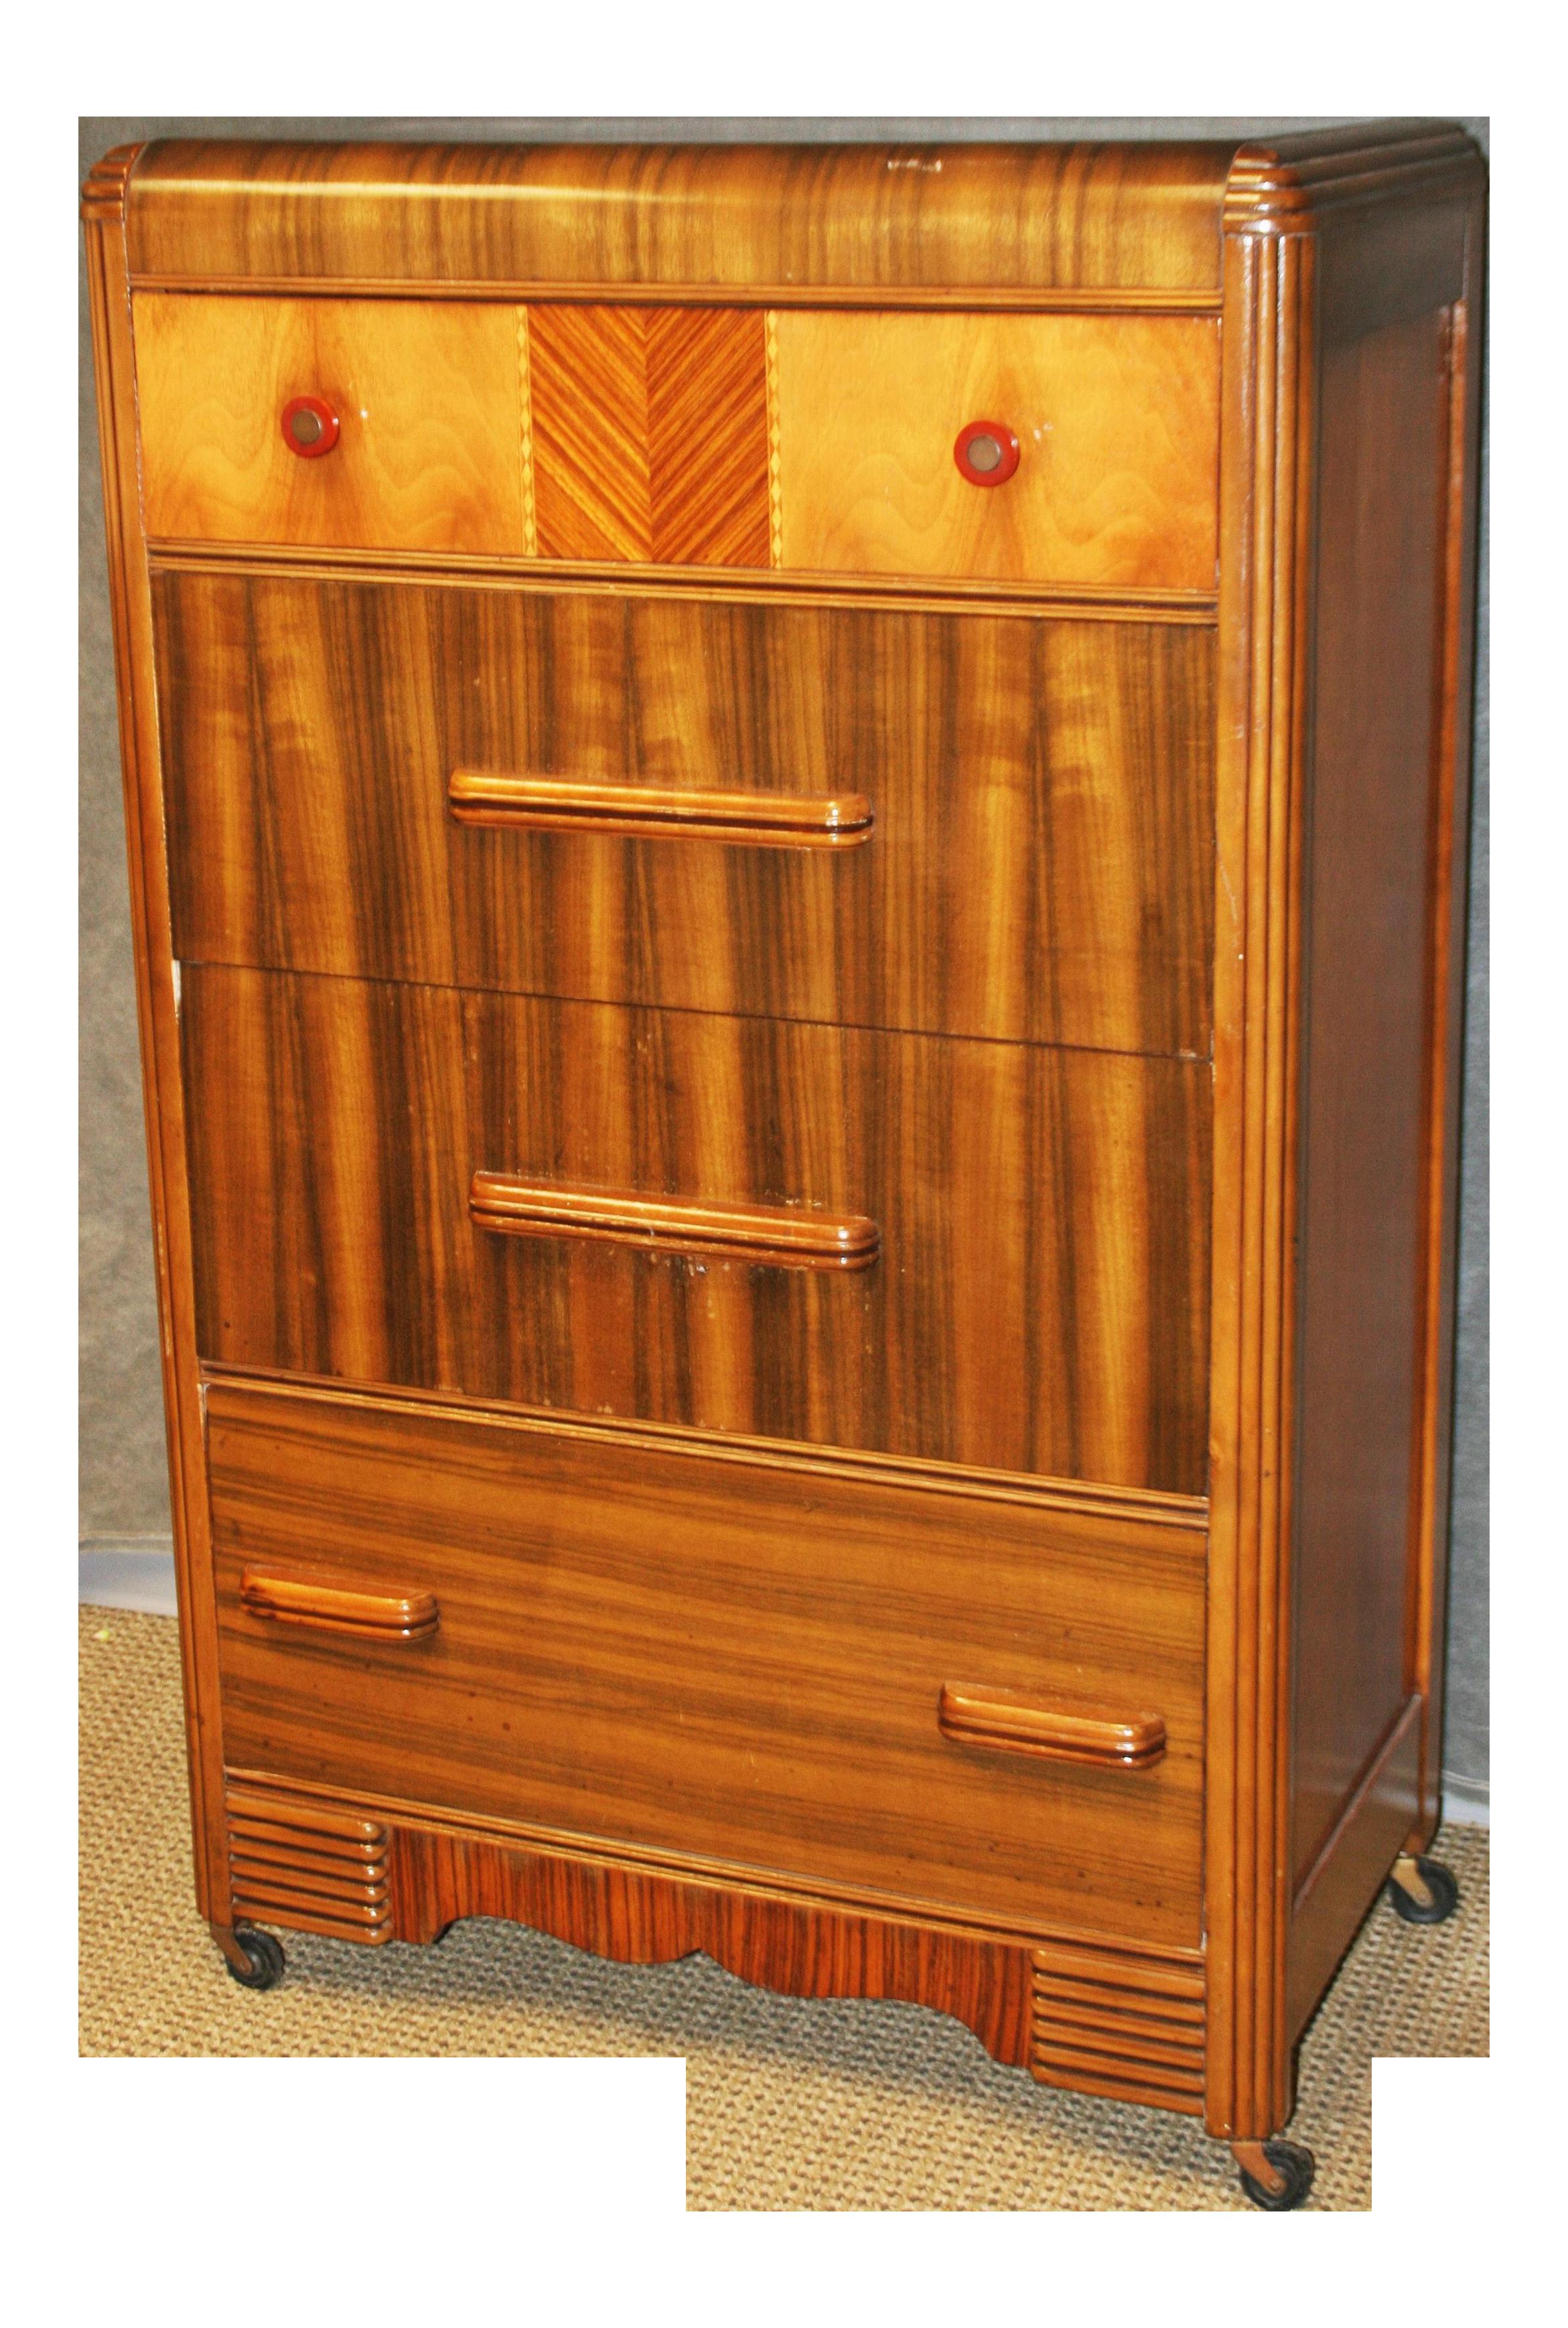 Art Deco Waterfall Dresser With Bakelite Drawer Pulls